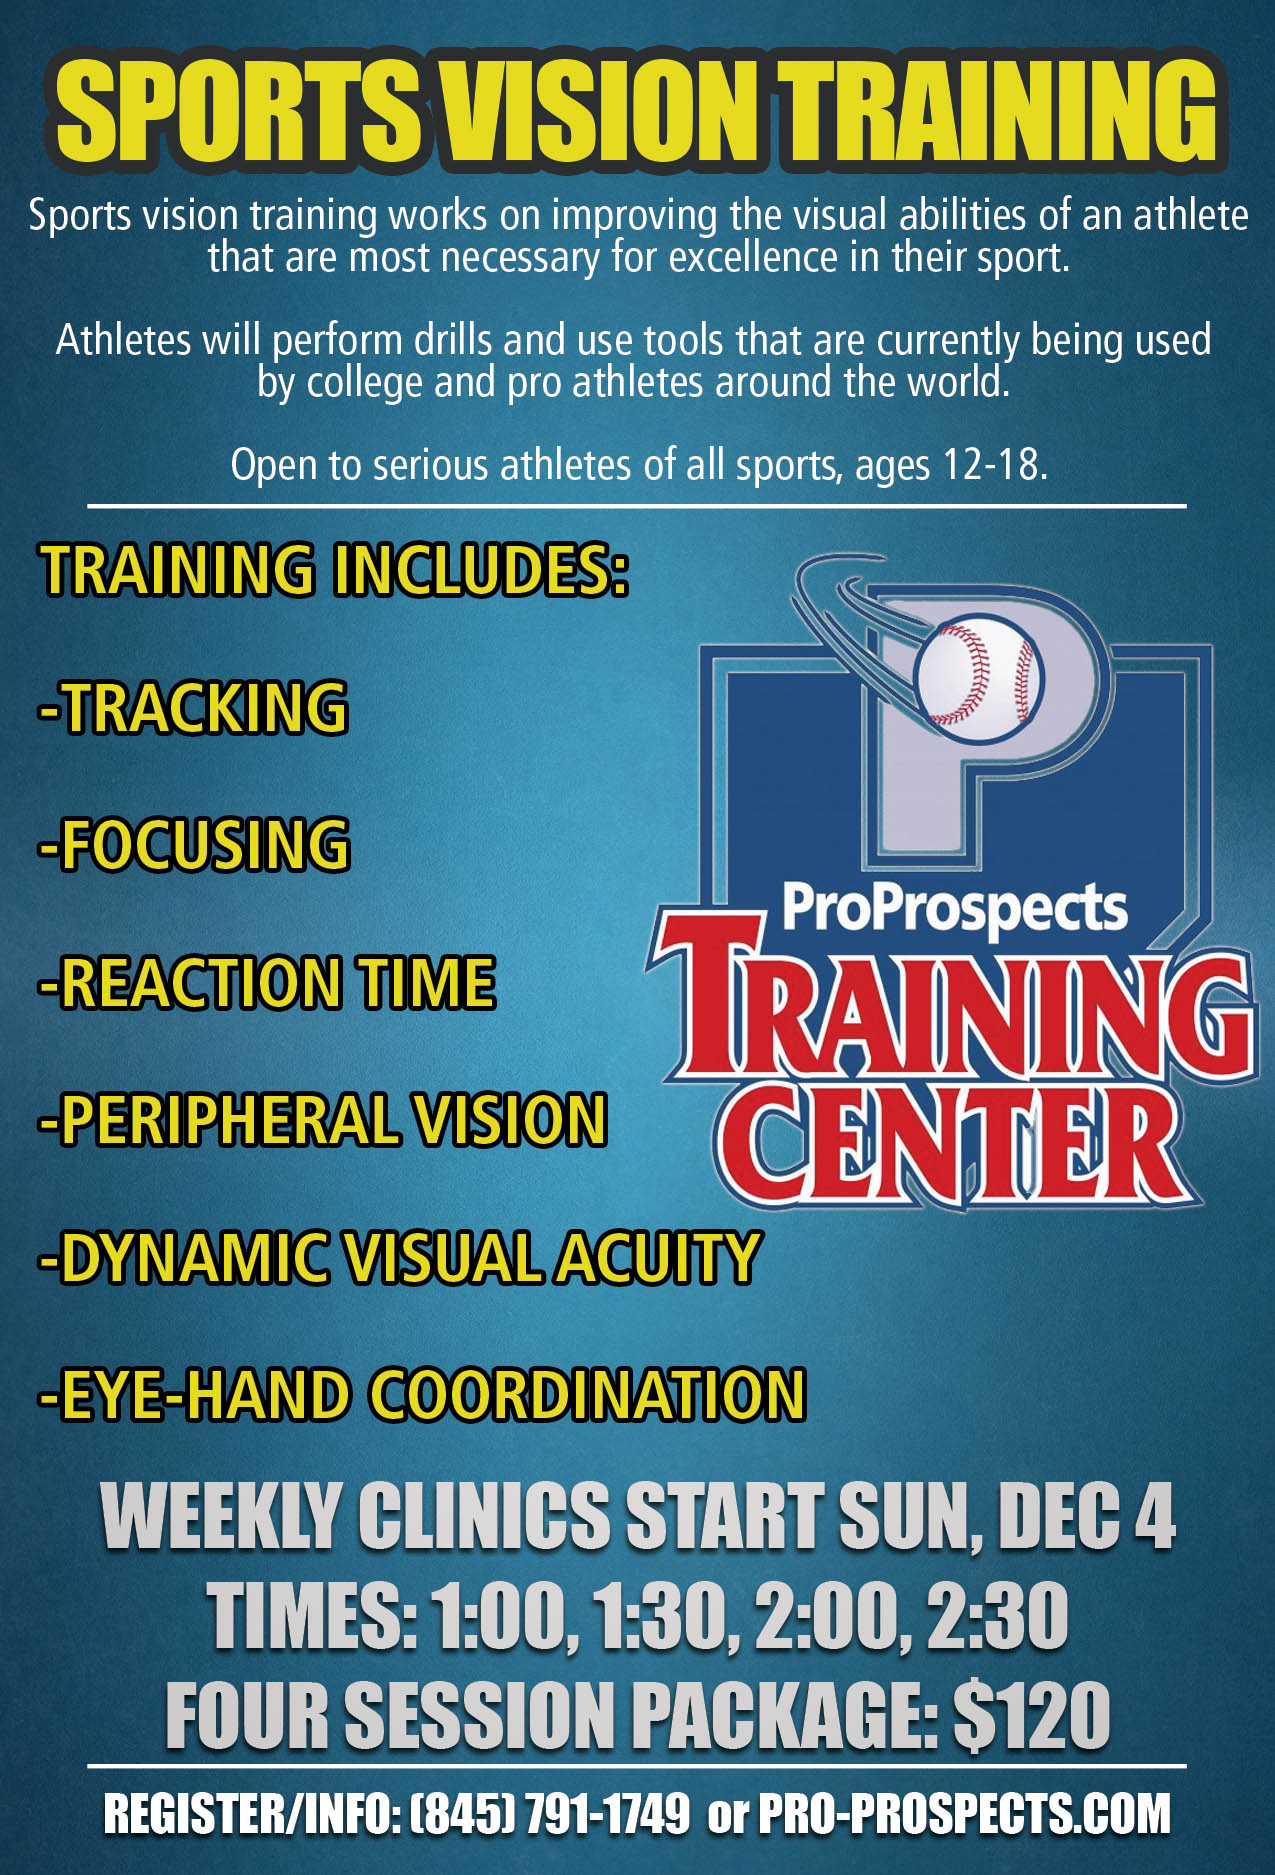 Pro Prospects Fall Winter Clinic Flyer